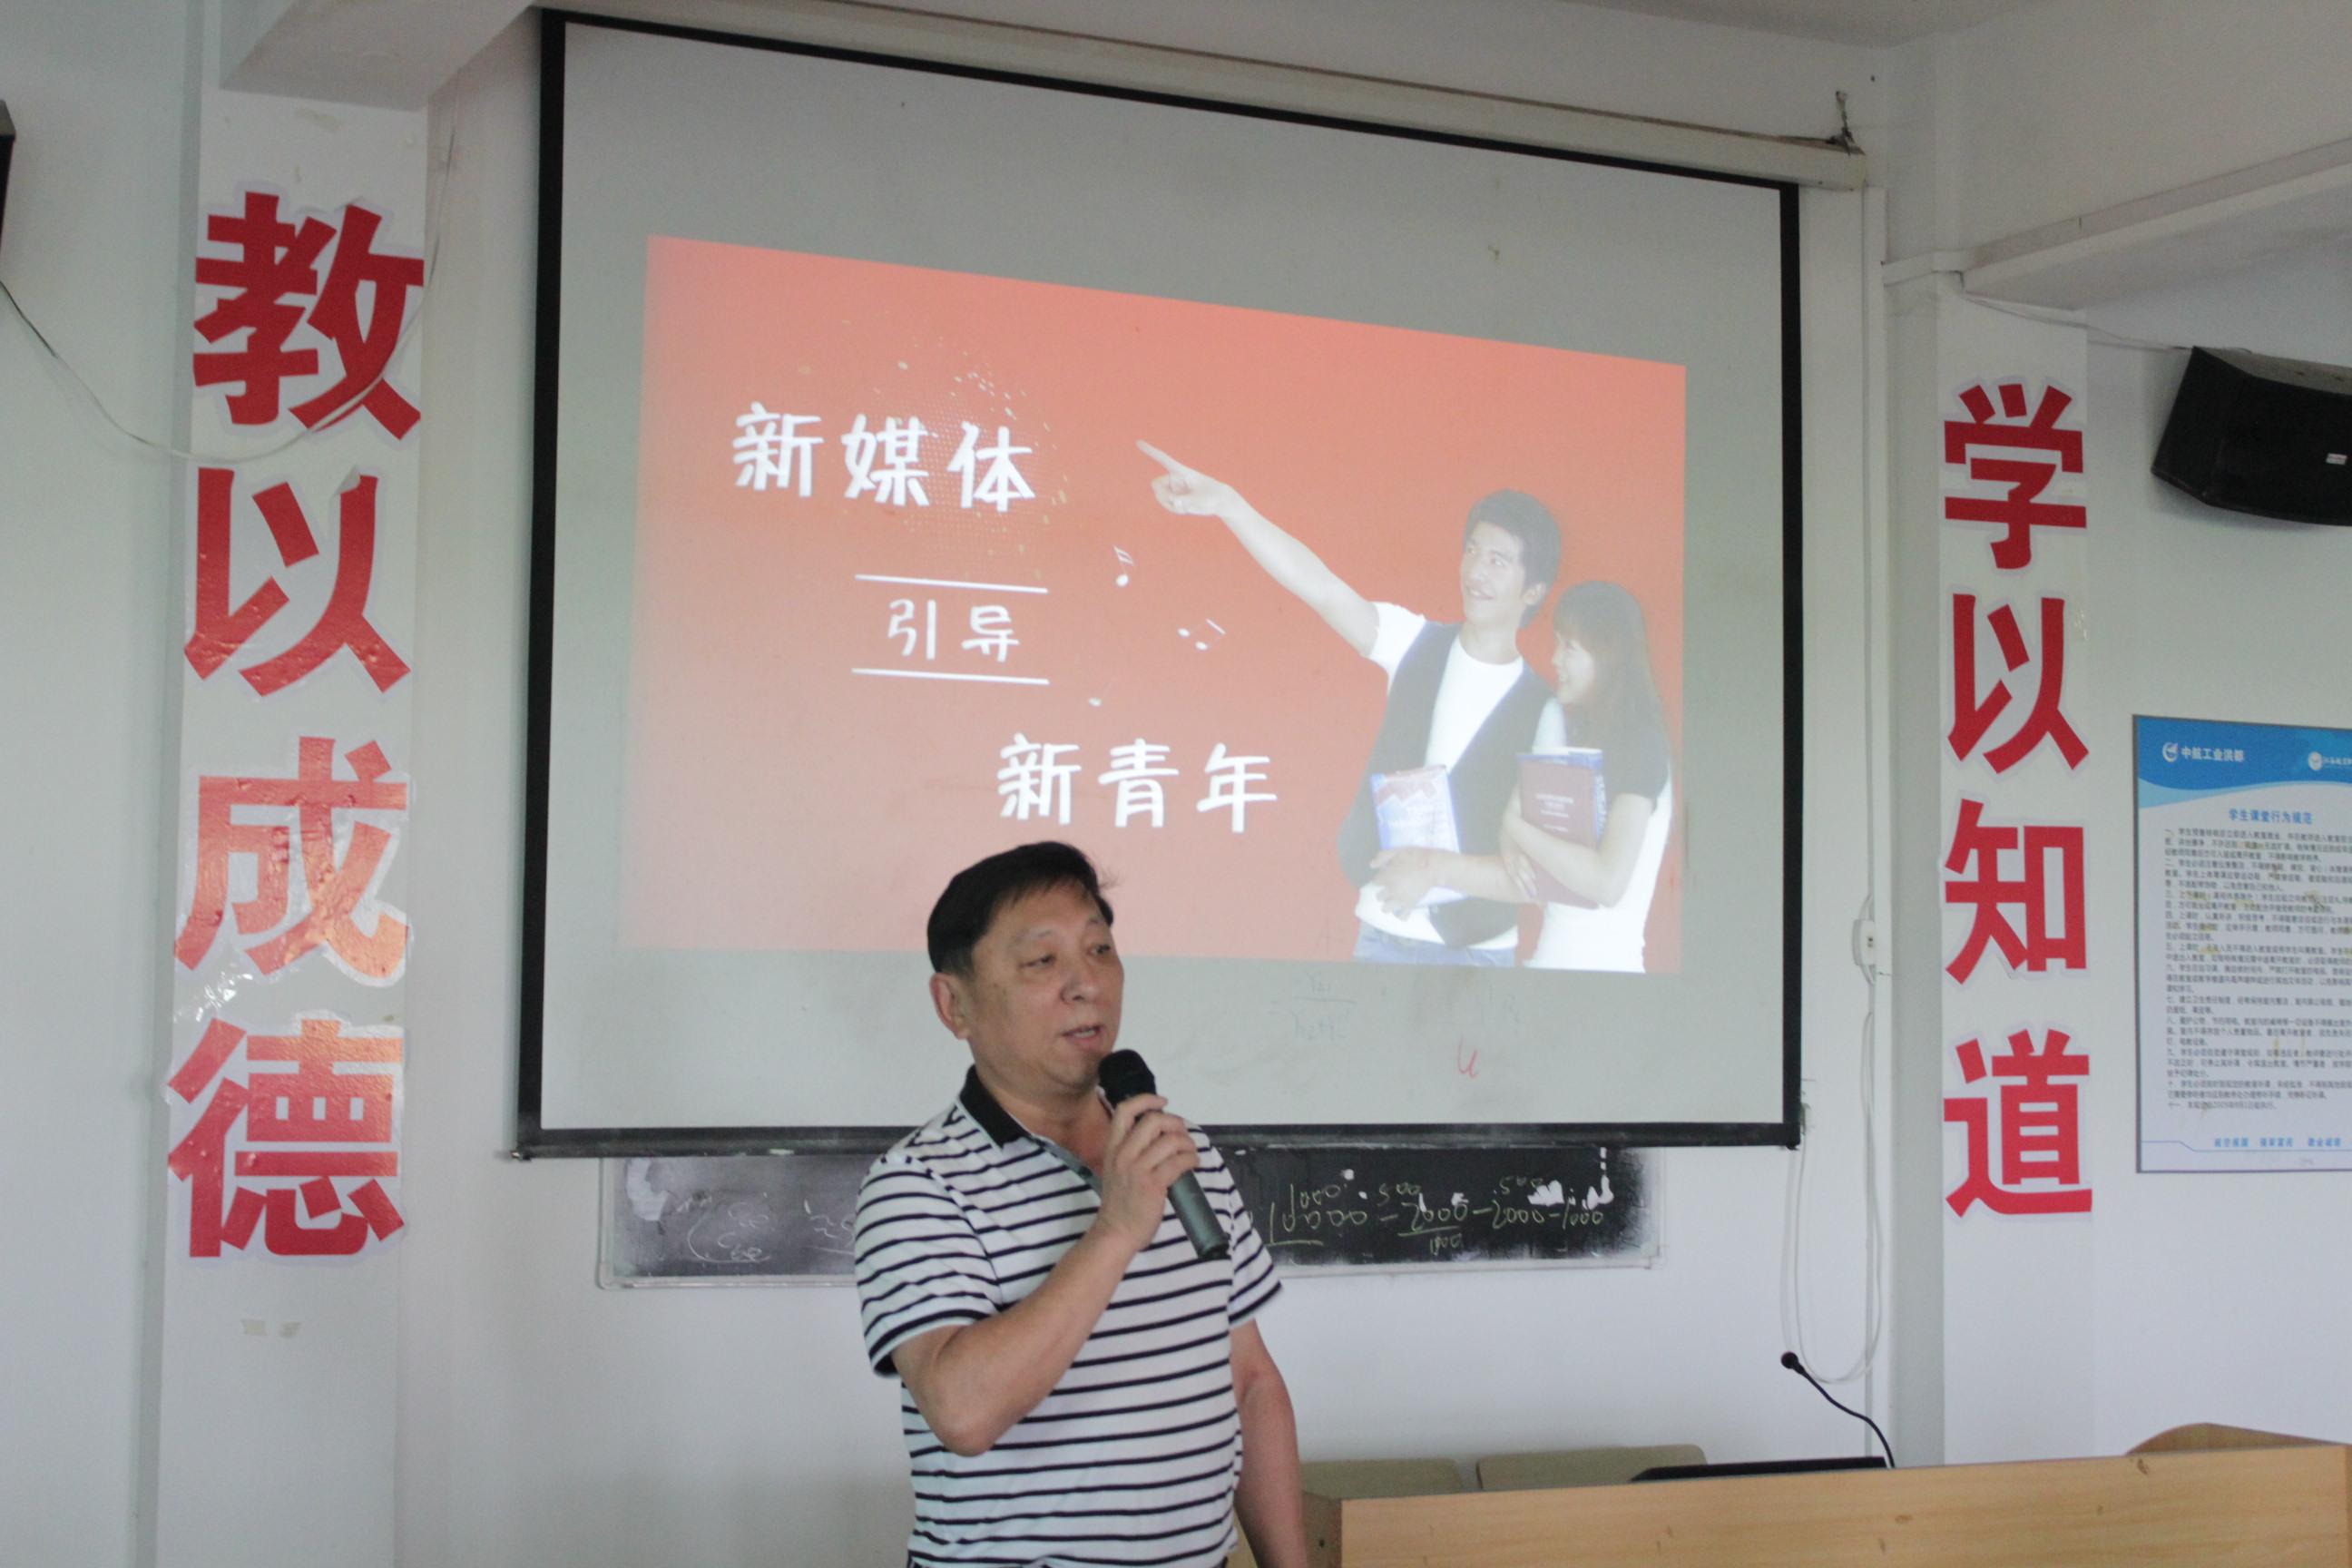 IMG_6424新媒体引导新青年.JPG